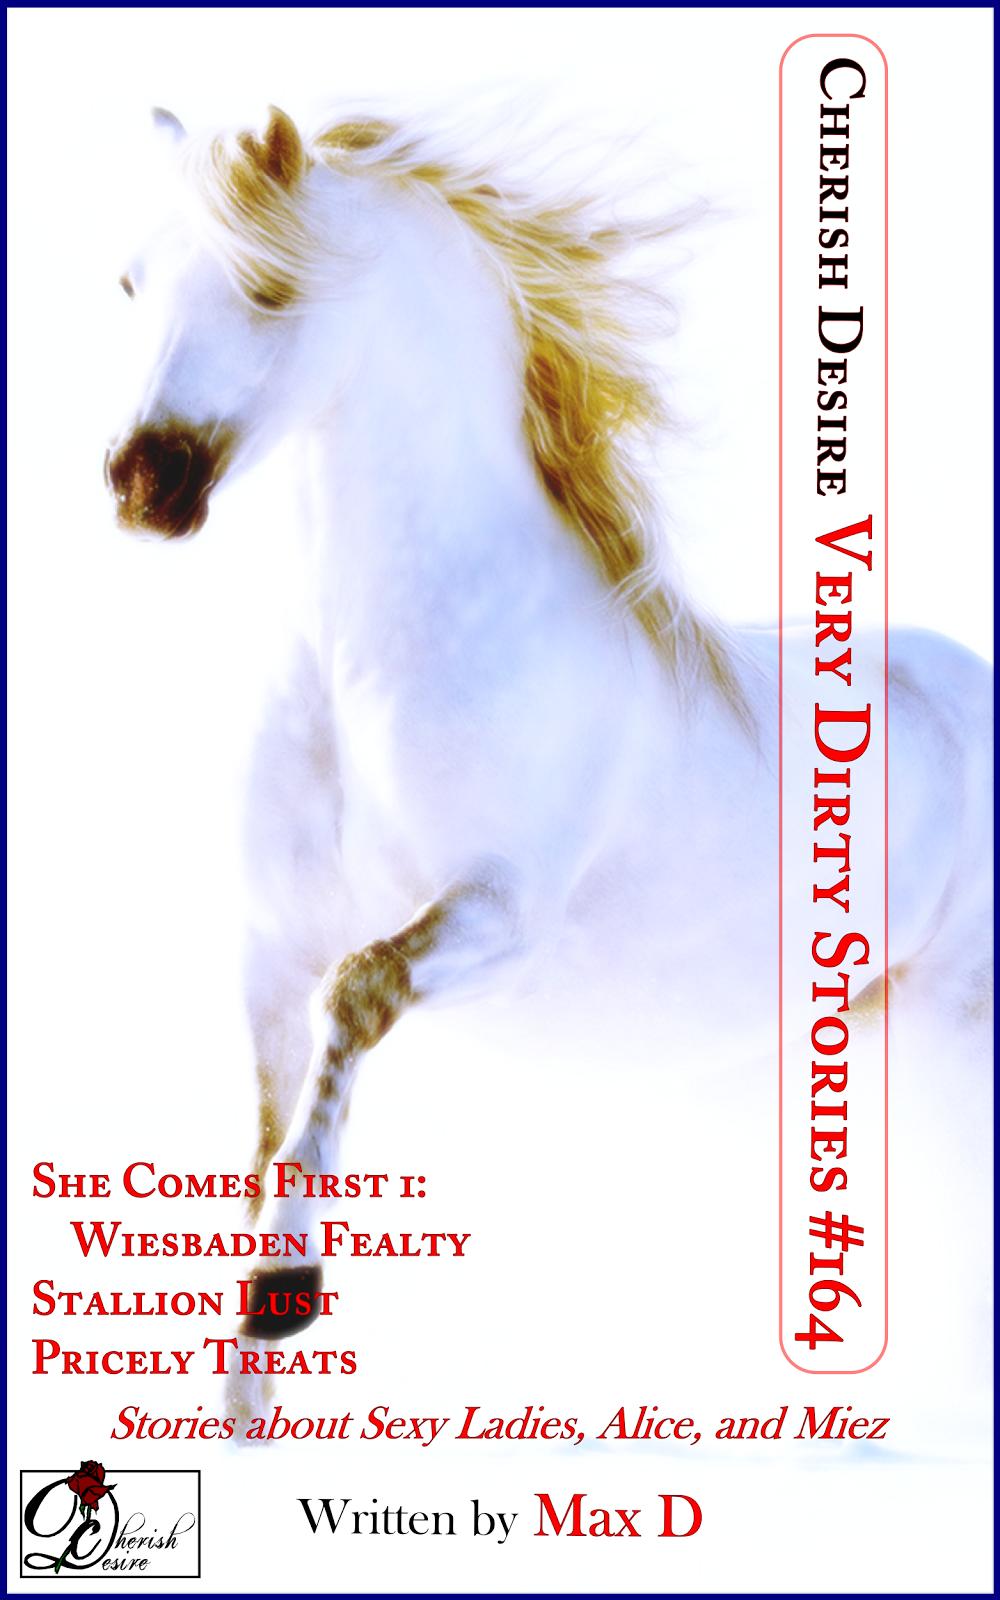 Cherish Desire: Very Dirty Stories #164, Max D, erotica